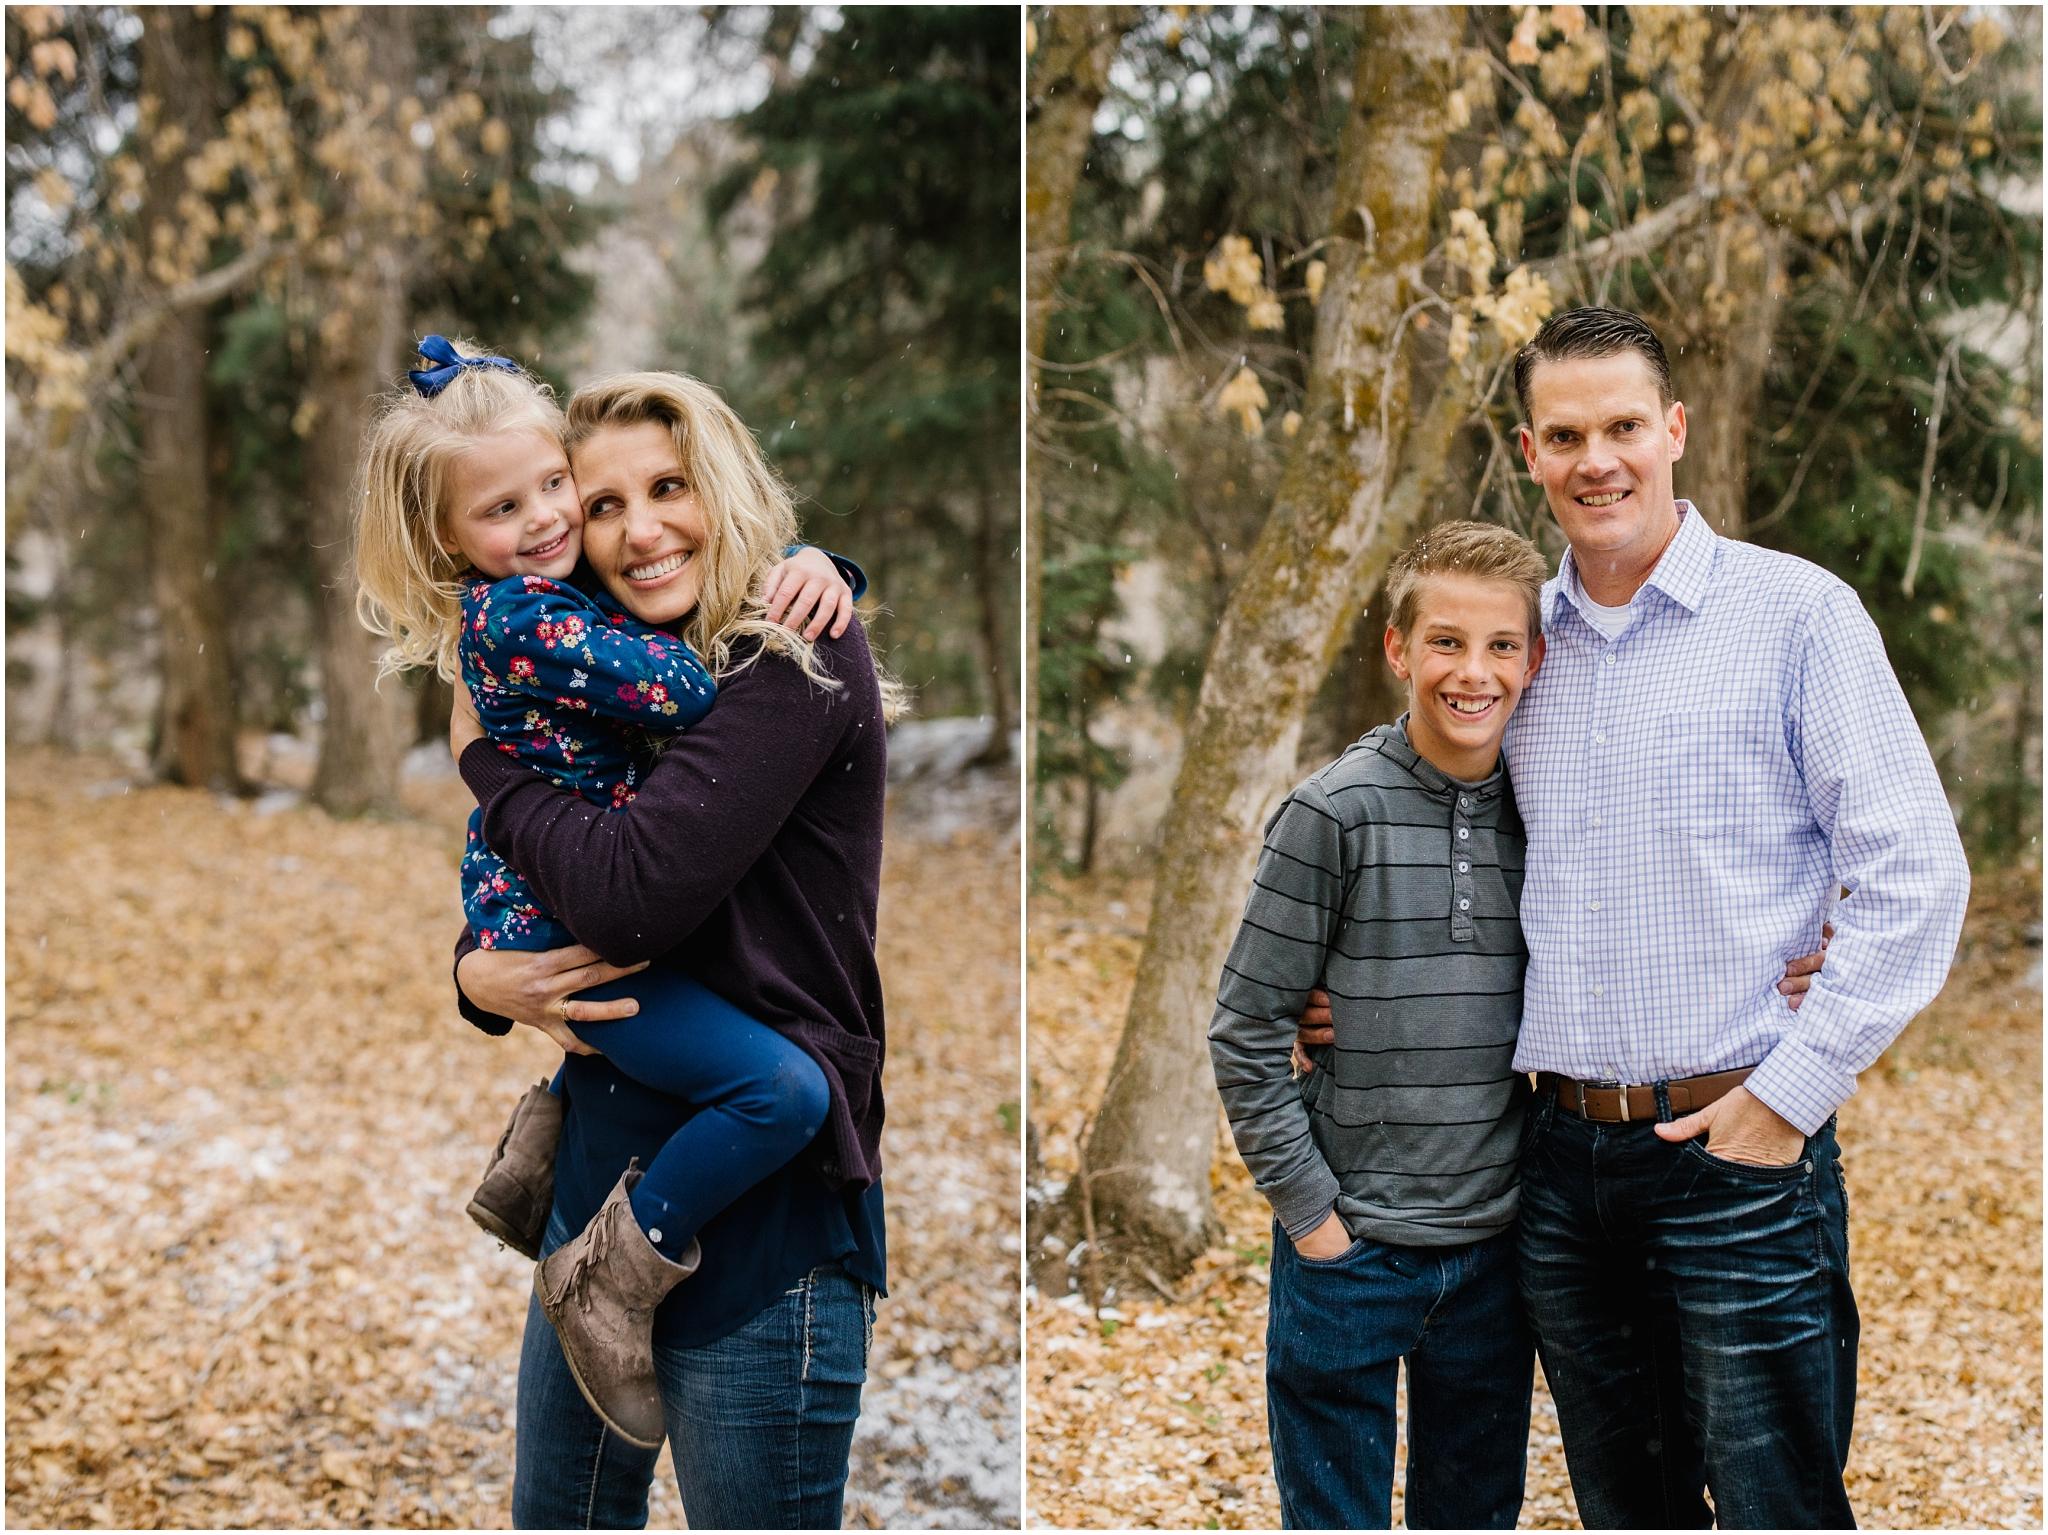 Vance-22_Lizzie-B-Imagery-Utah-Family-Photographer-Salt-Lake-City-Park-City-Utah-County-Payson-Canyon.jpg